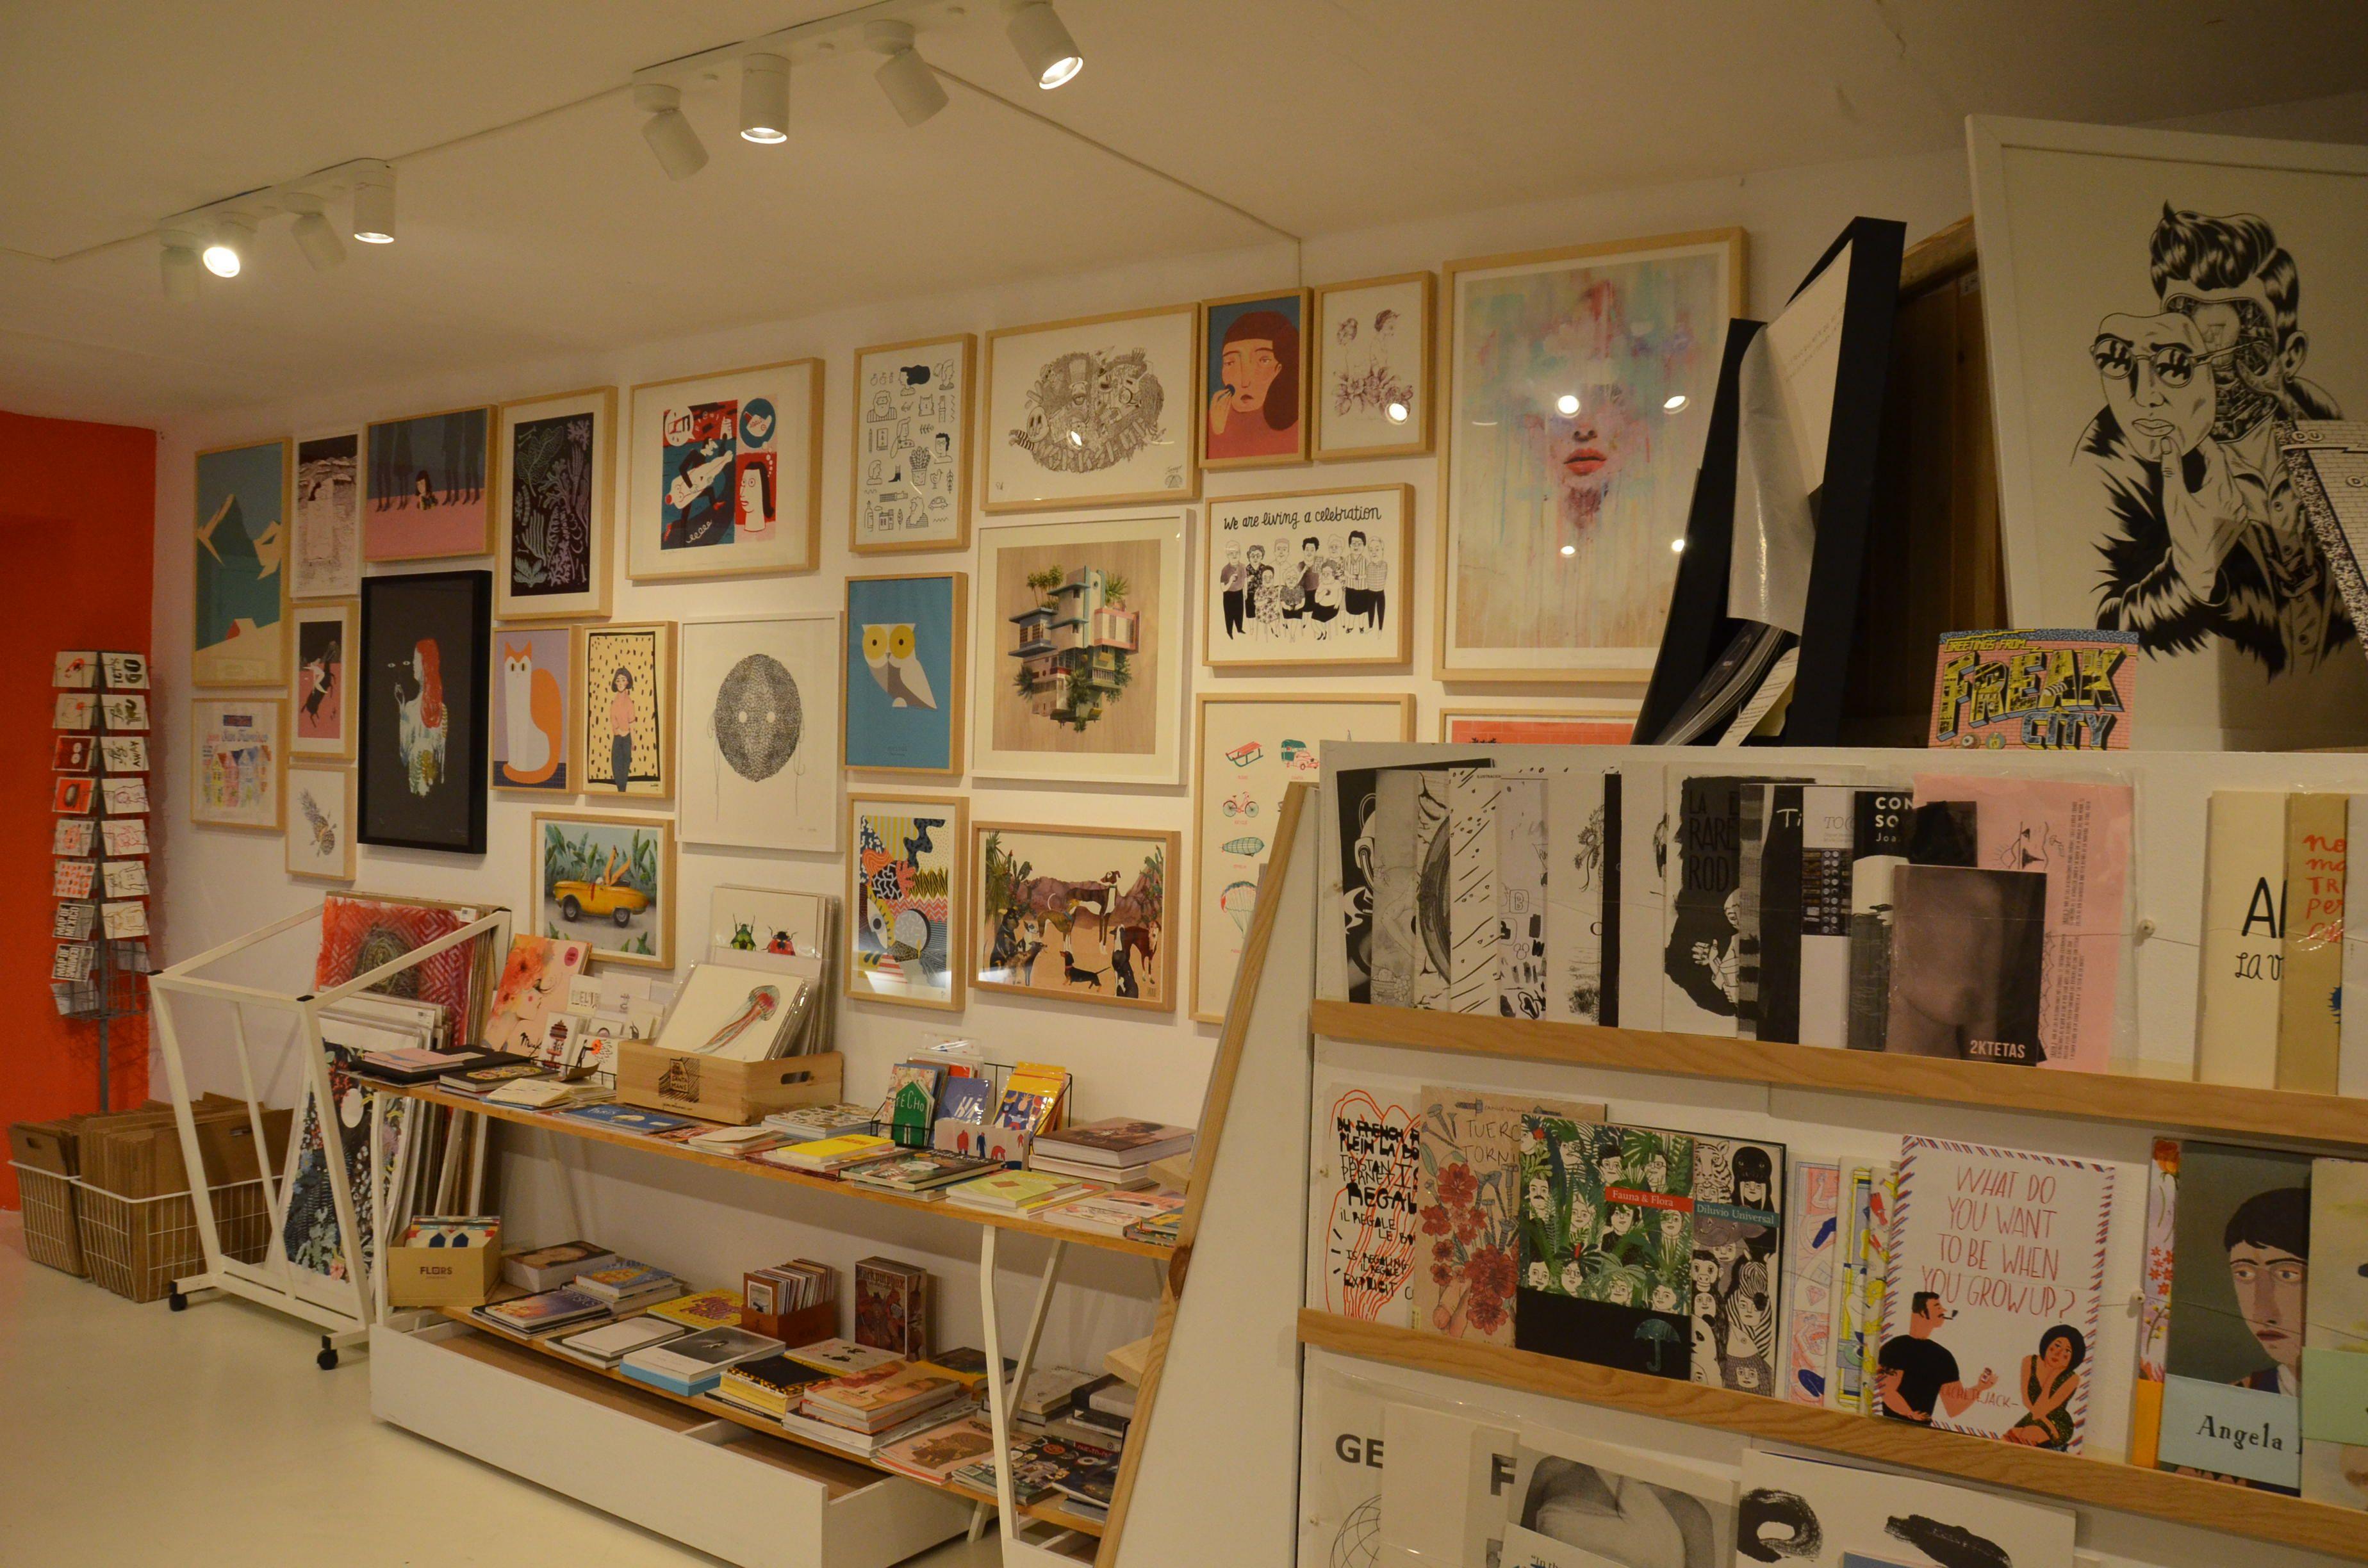 Miscelanea Gallery, Barcelona: All year